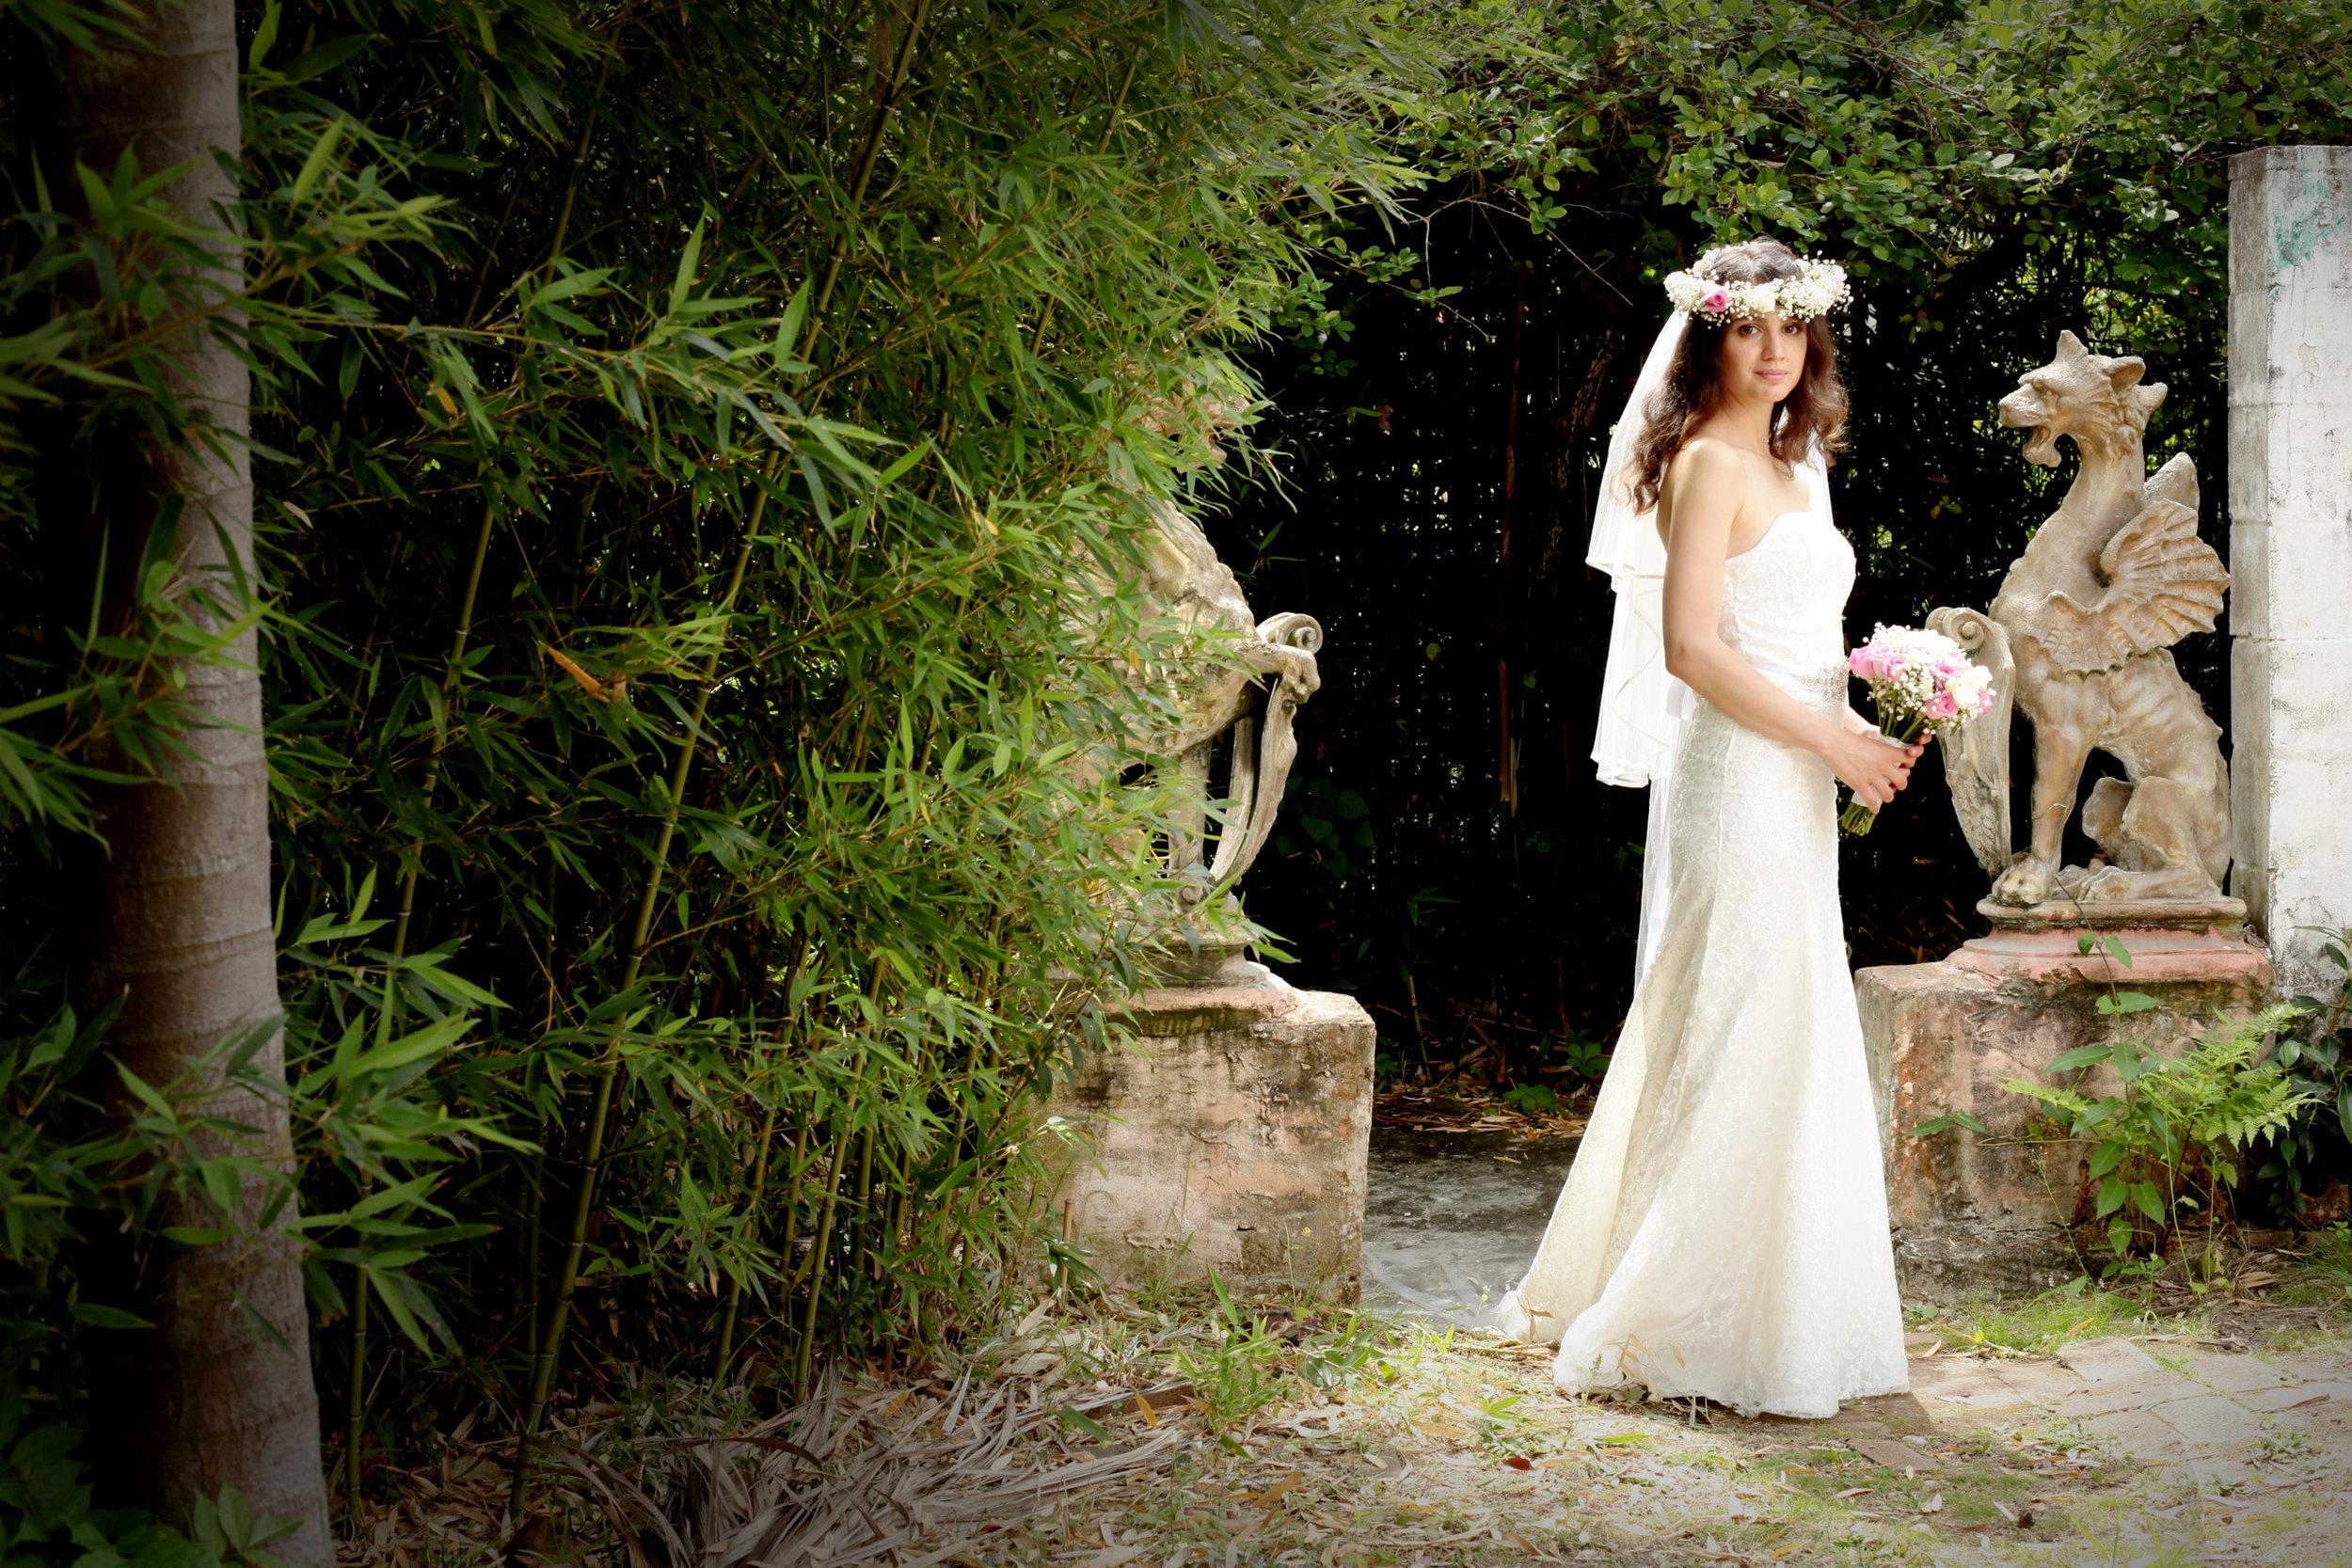 bride_and_Dragon.jpg